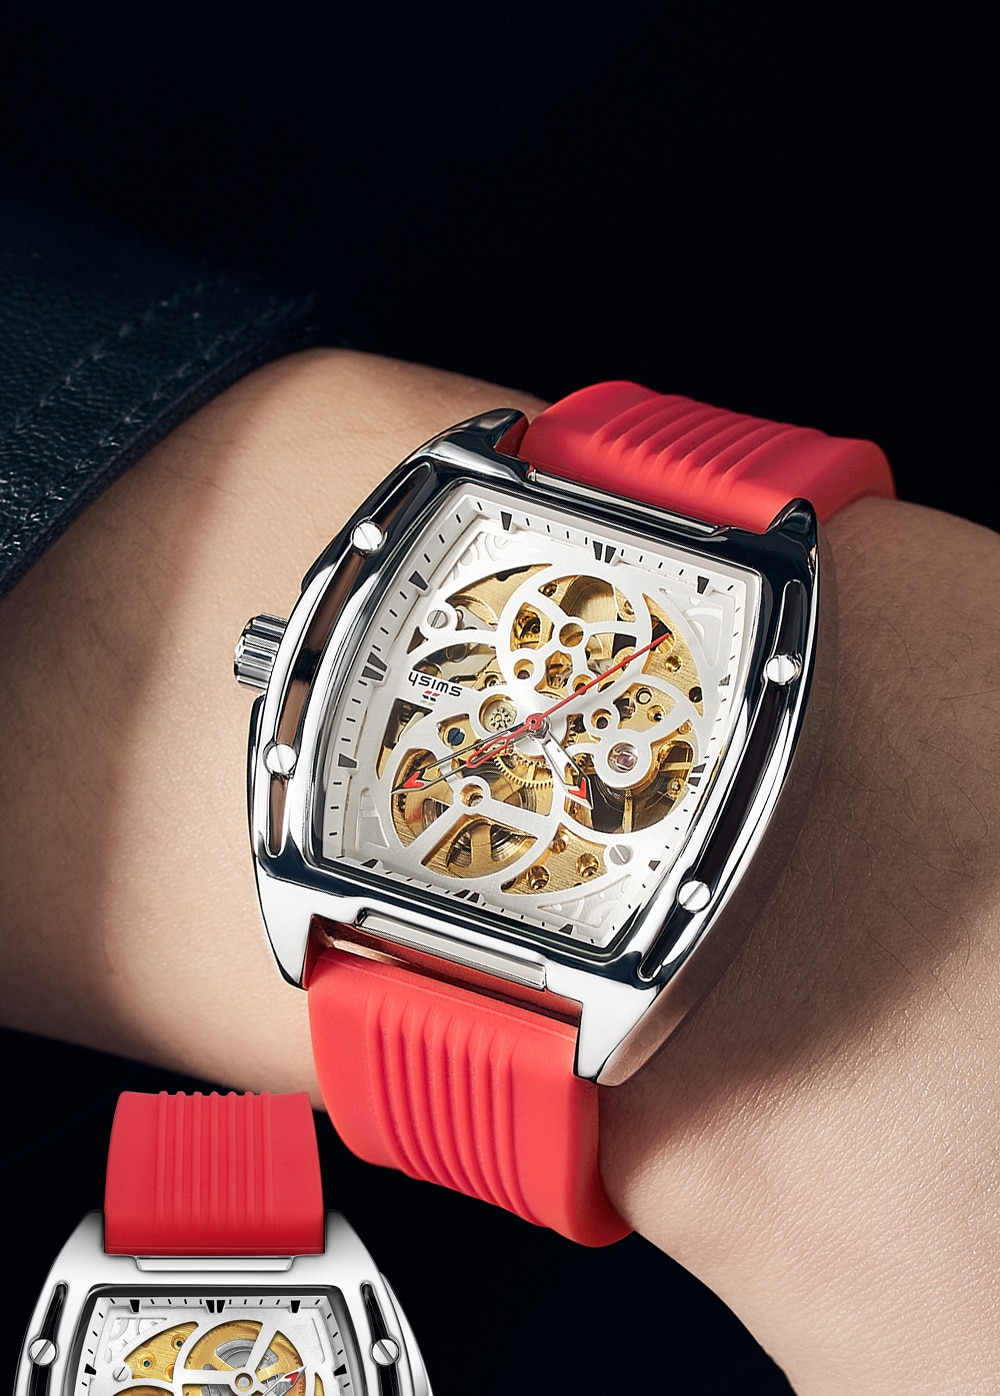 H9049f9d5f9d94b7b8d681d51ef5646a93 SWISH Brand Design Luxury Men's Mechanical Wristwatch